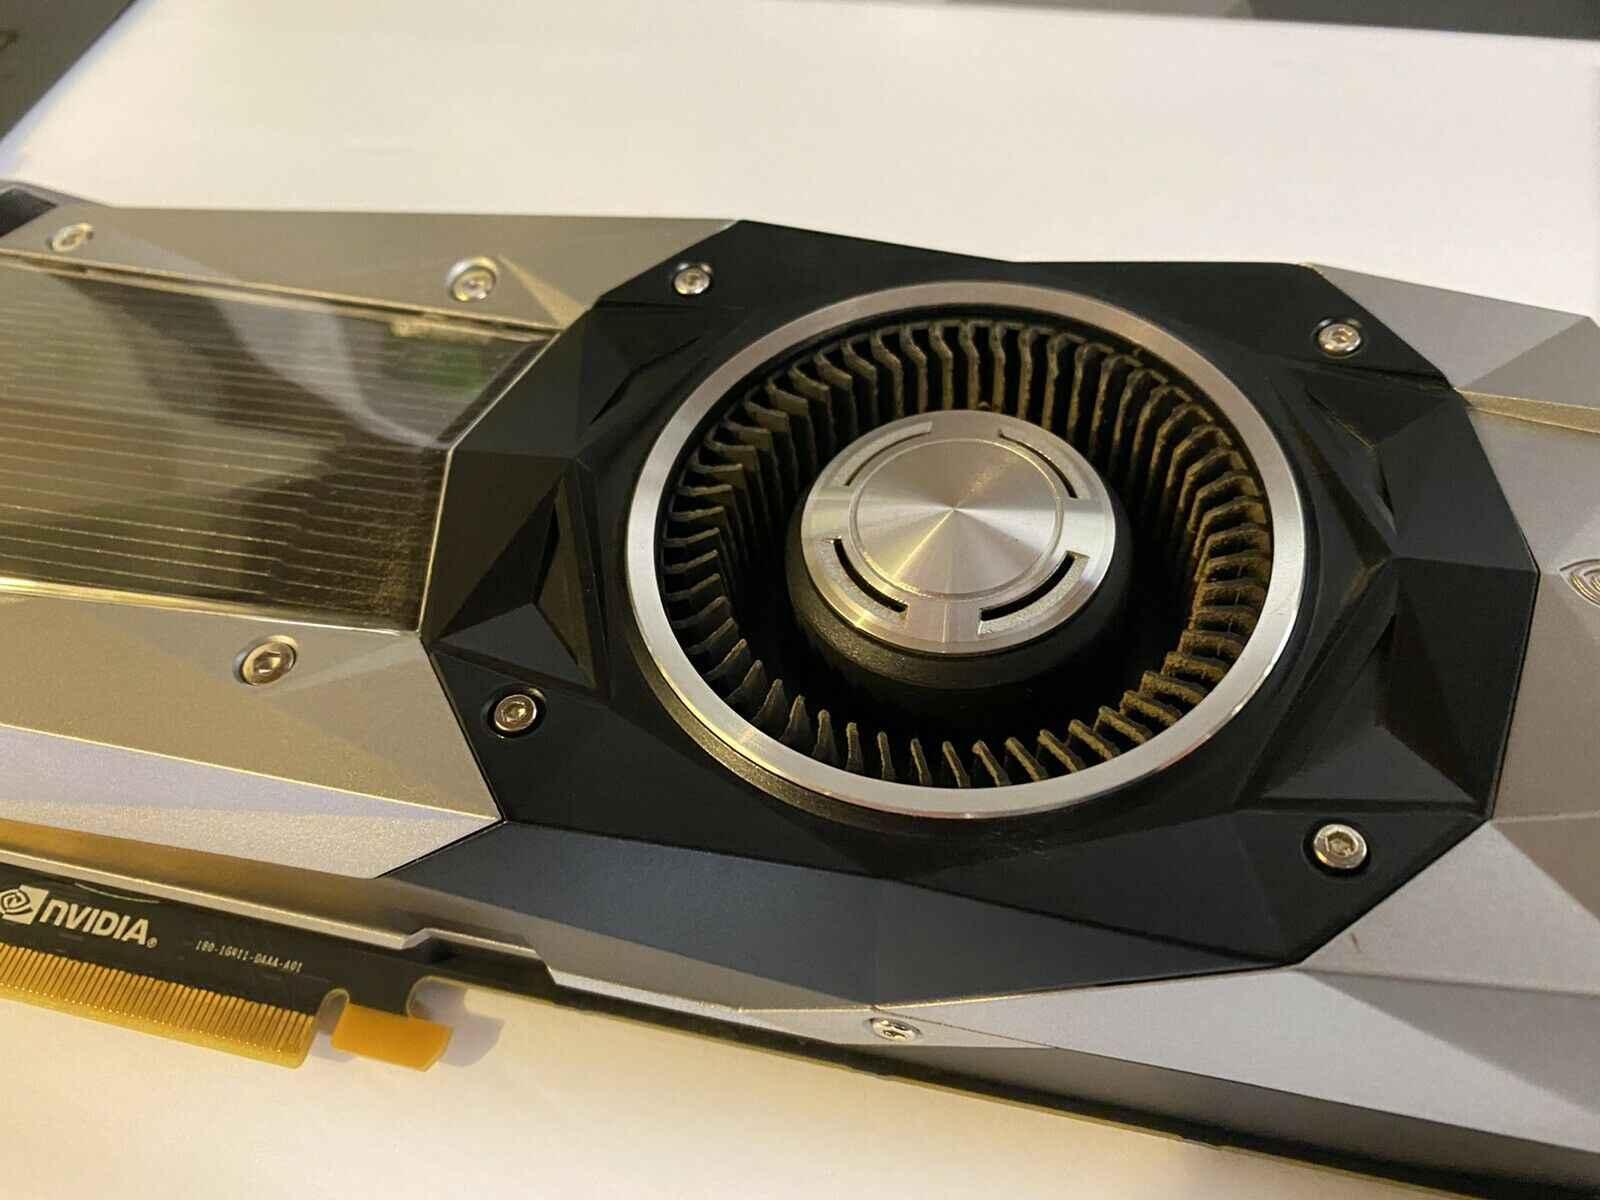 NVIDIA GeForce GTX 1070 Founders Edition 8GB GDDR5 Graphics Card GPU Bemowo - zdjęcie 9